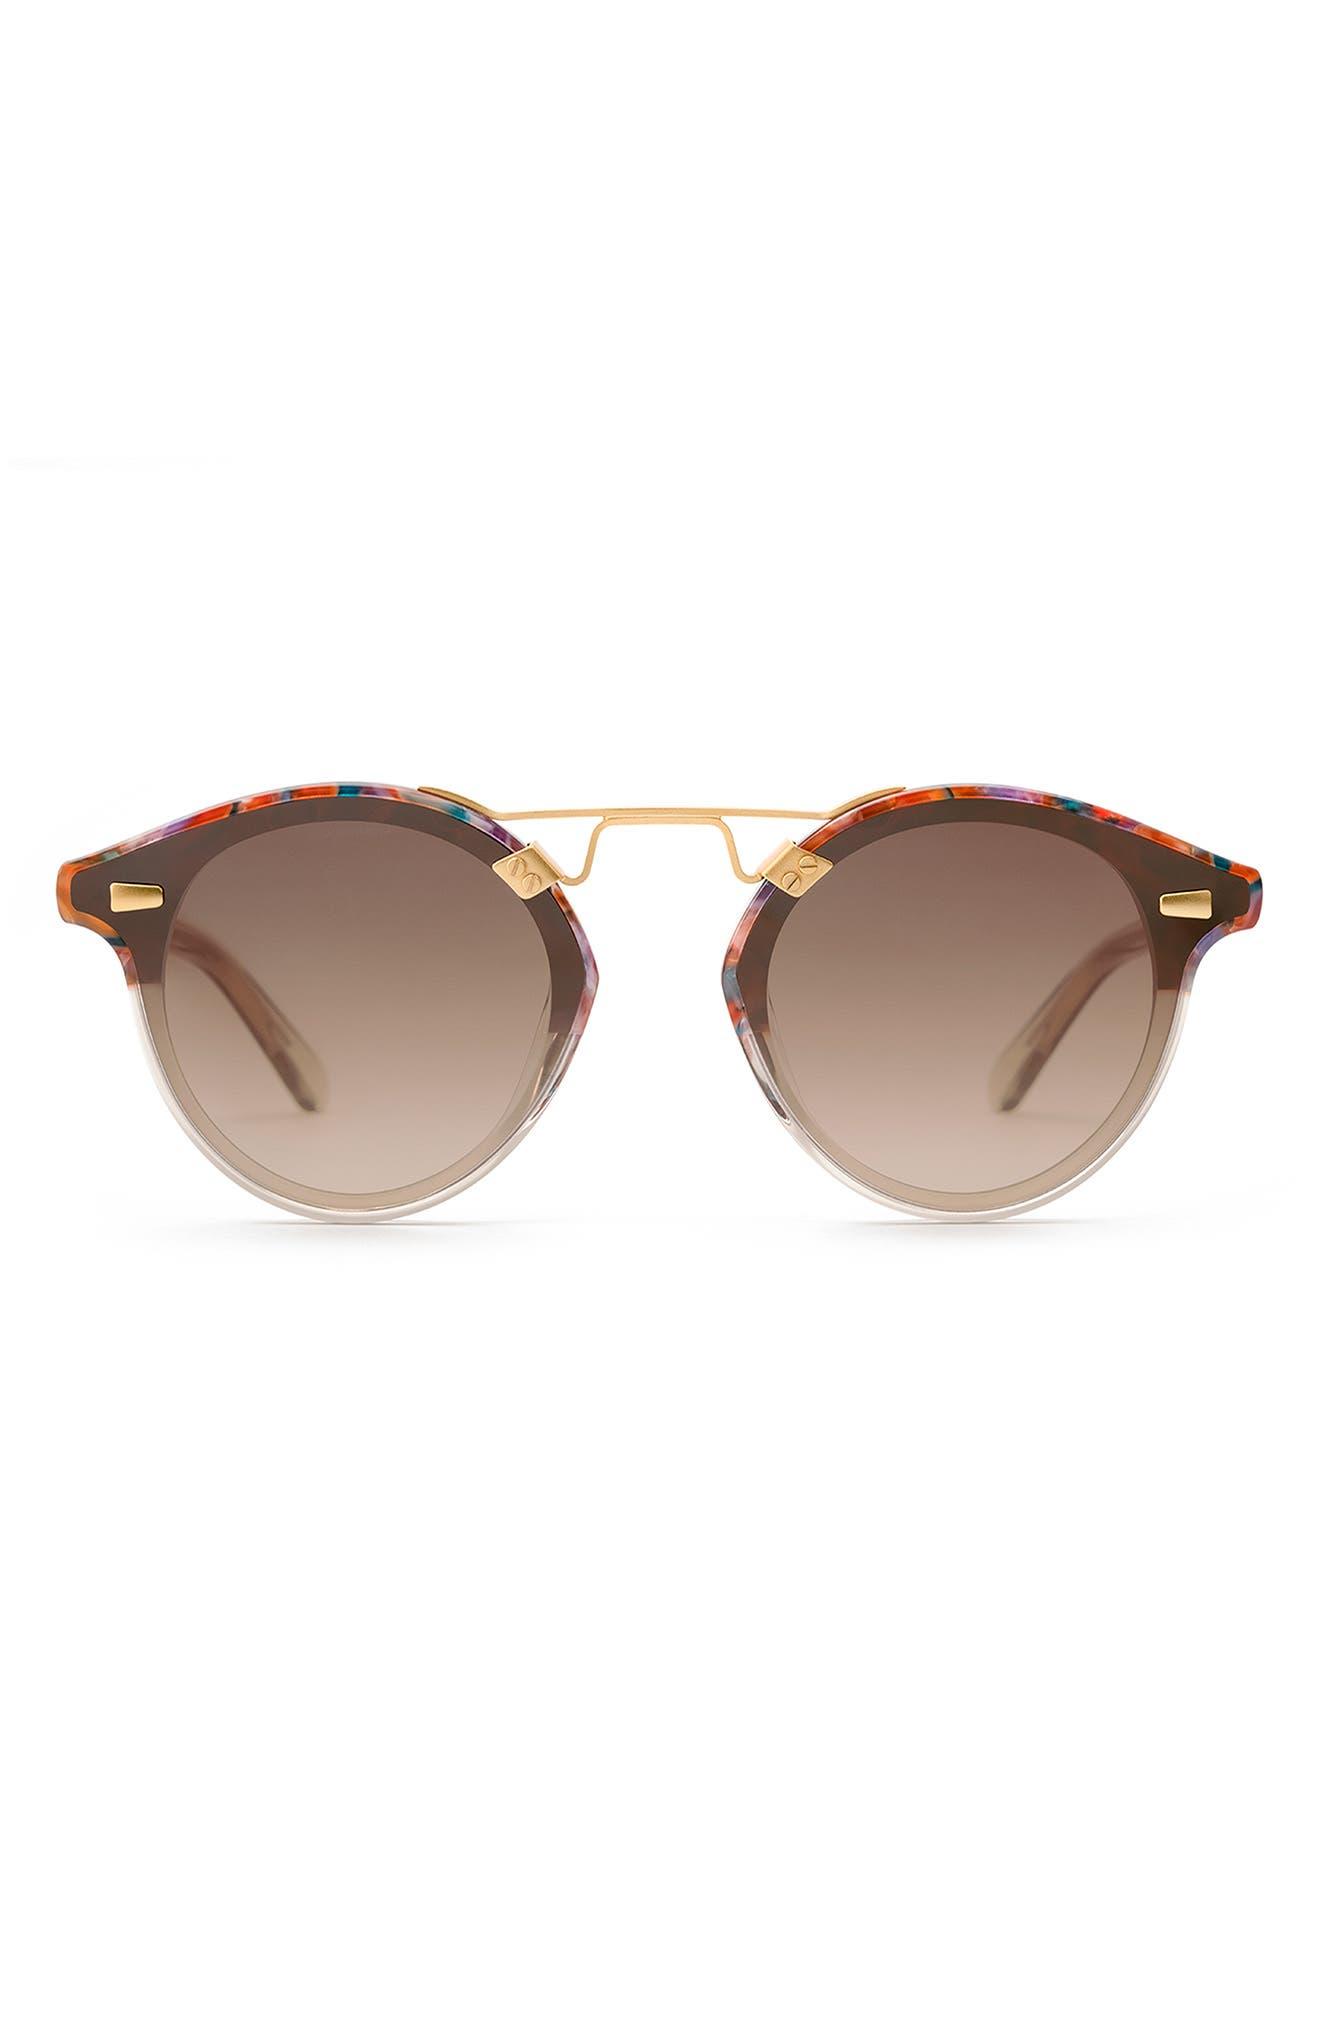 Stl 63mm Round Sunglasses